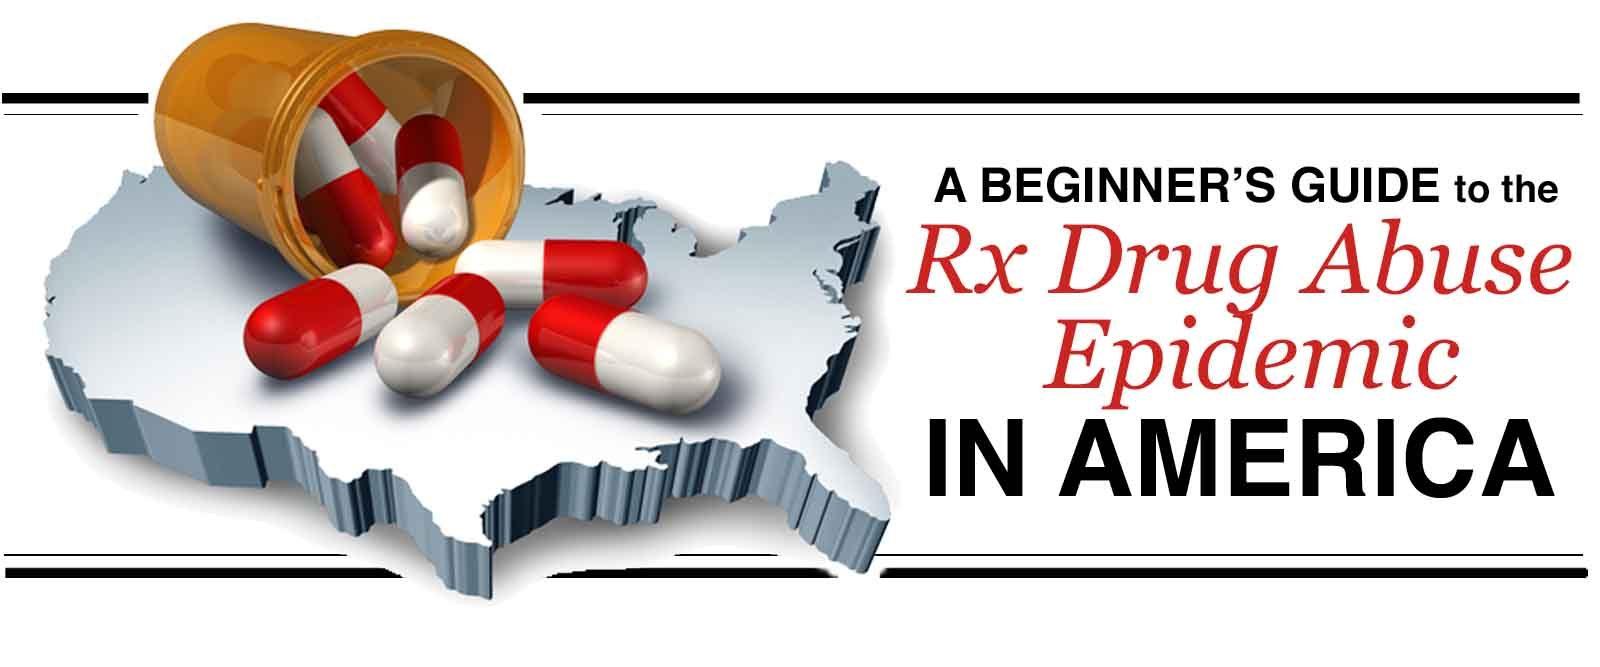 The beginner's guide to prescription drug abuse epidemic in America